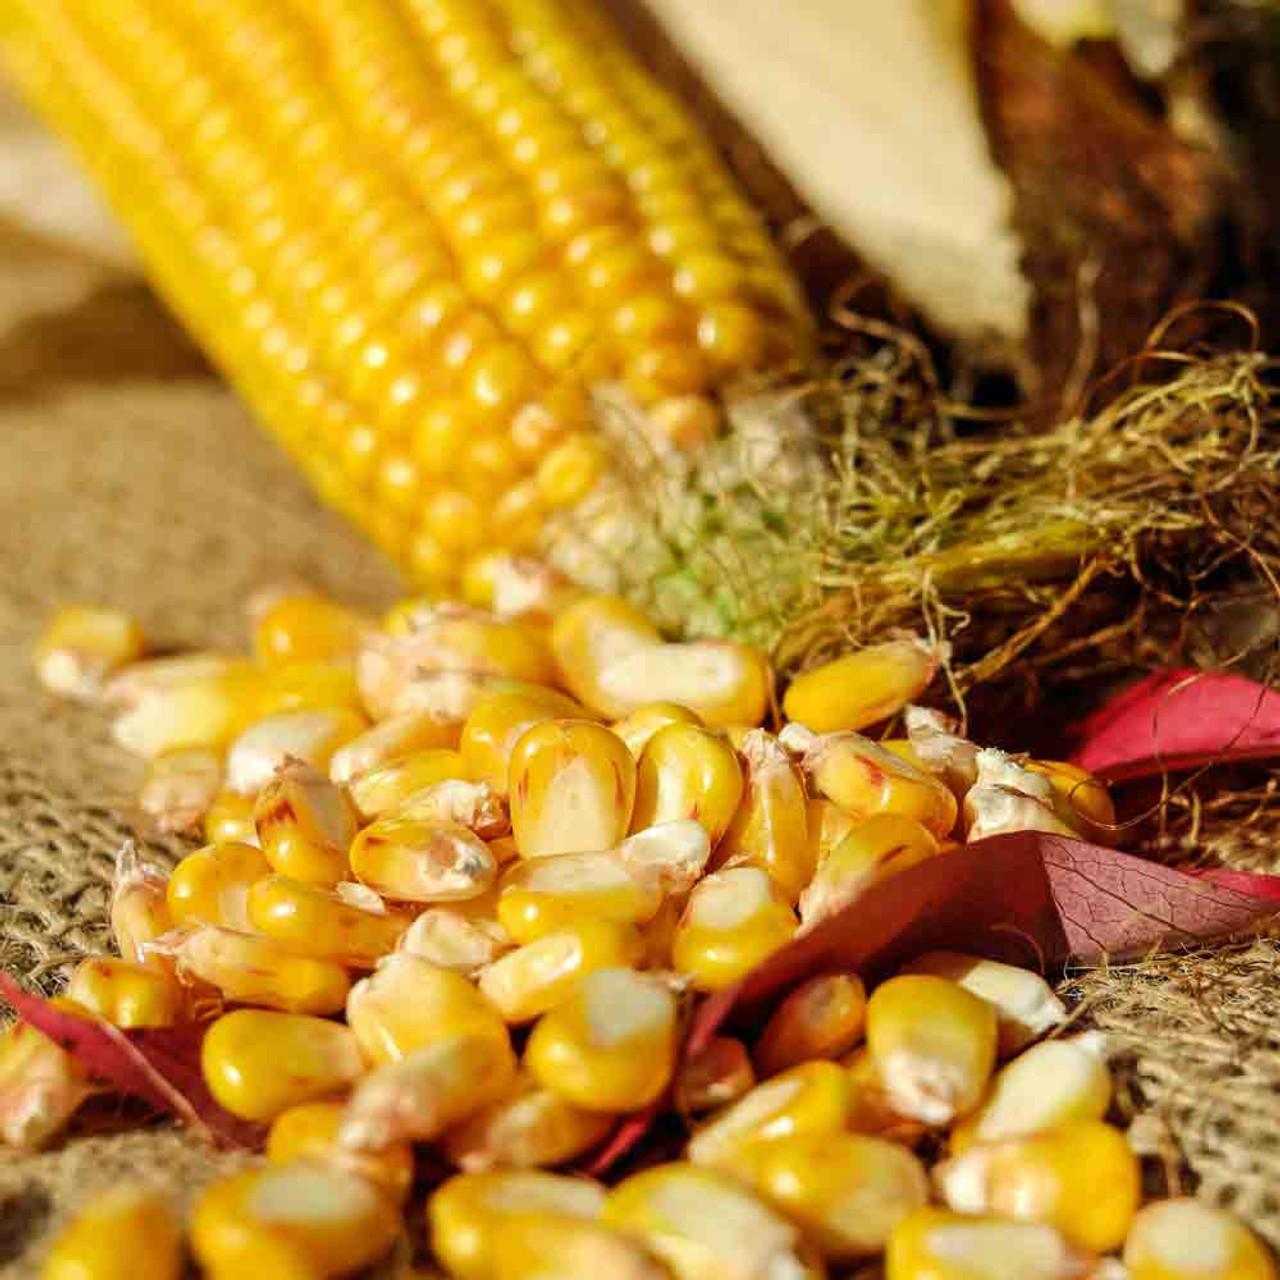 Golden Bantam Corn Seeds - (Zea mays)